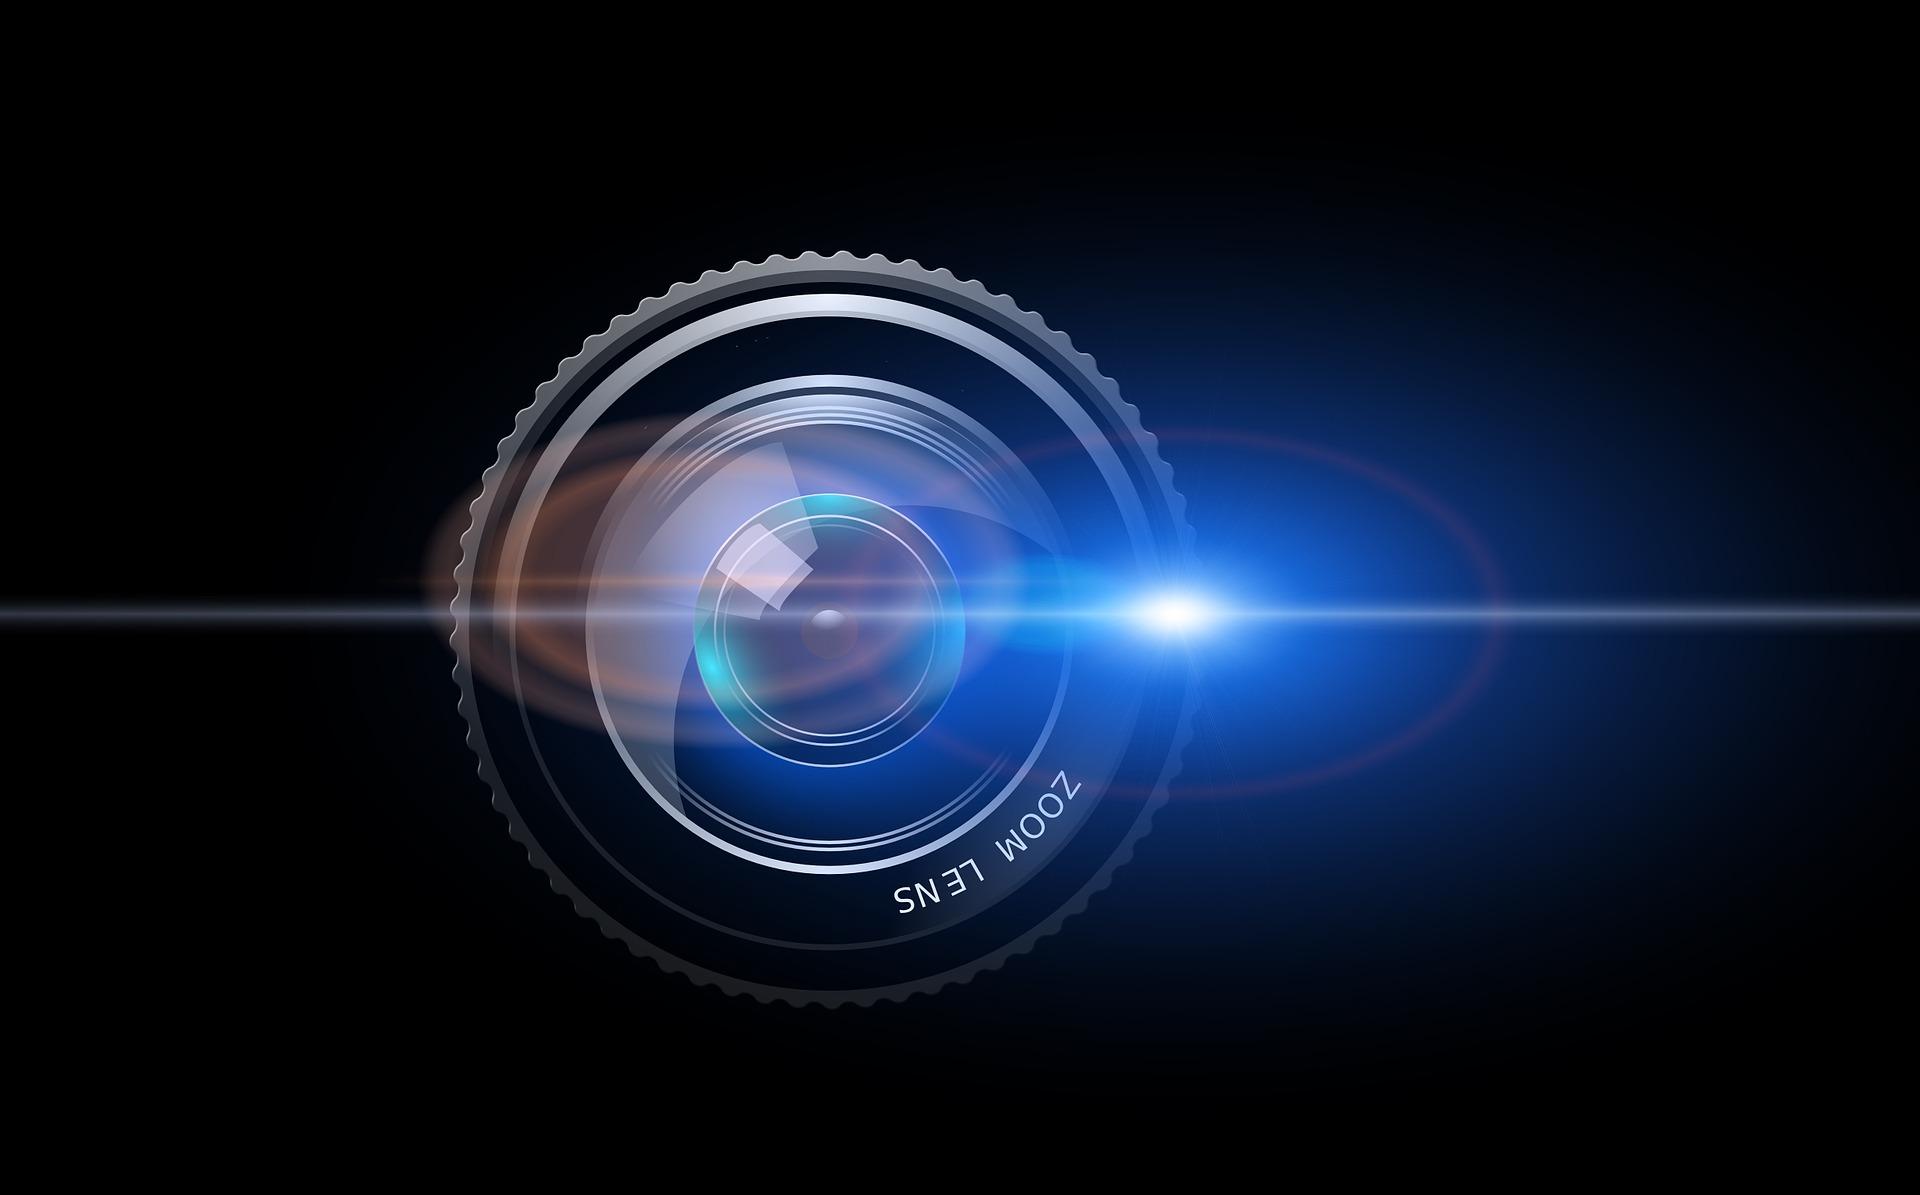 Zoom Lens - Objektiv mit Reflektionen